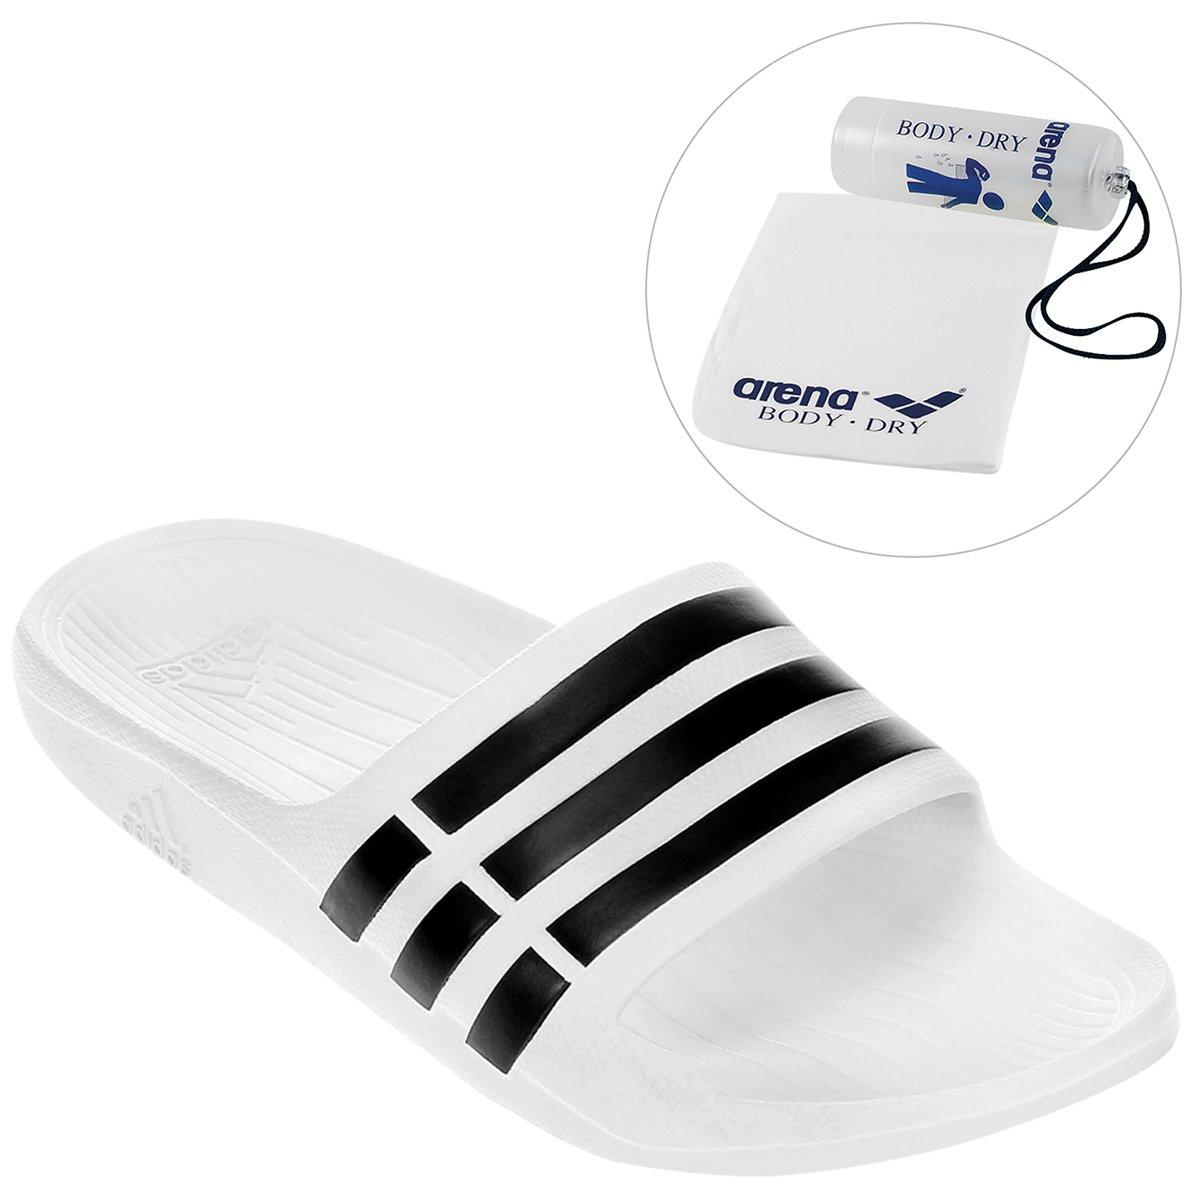 6022b49890 Kit Chinelo Adidas Duramo Slide + Toalha Arena Body - Compre Agora ...